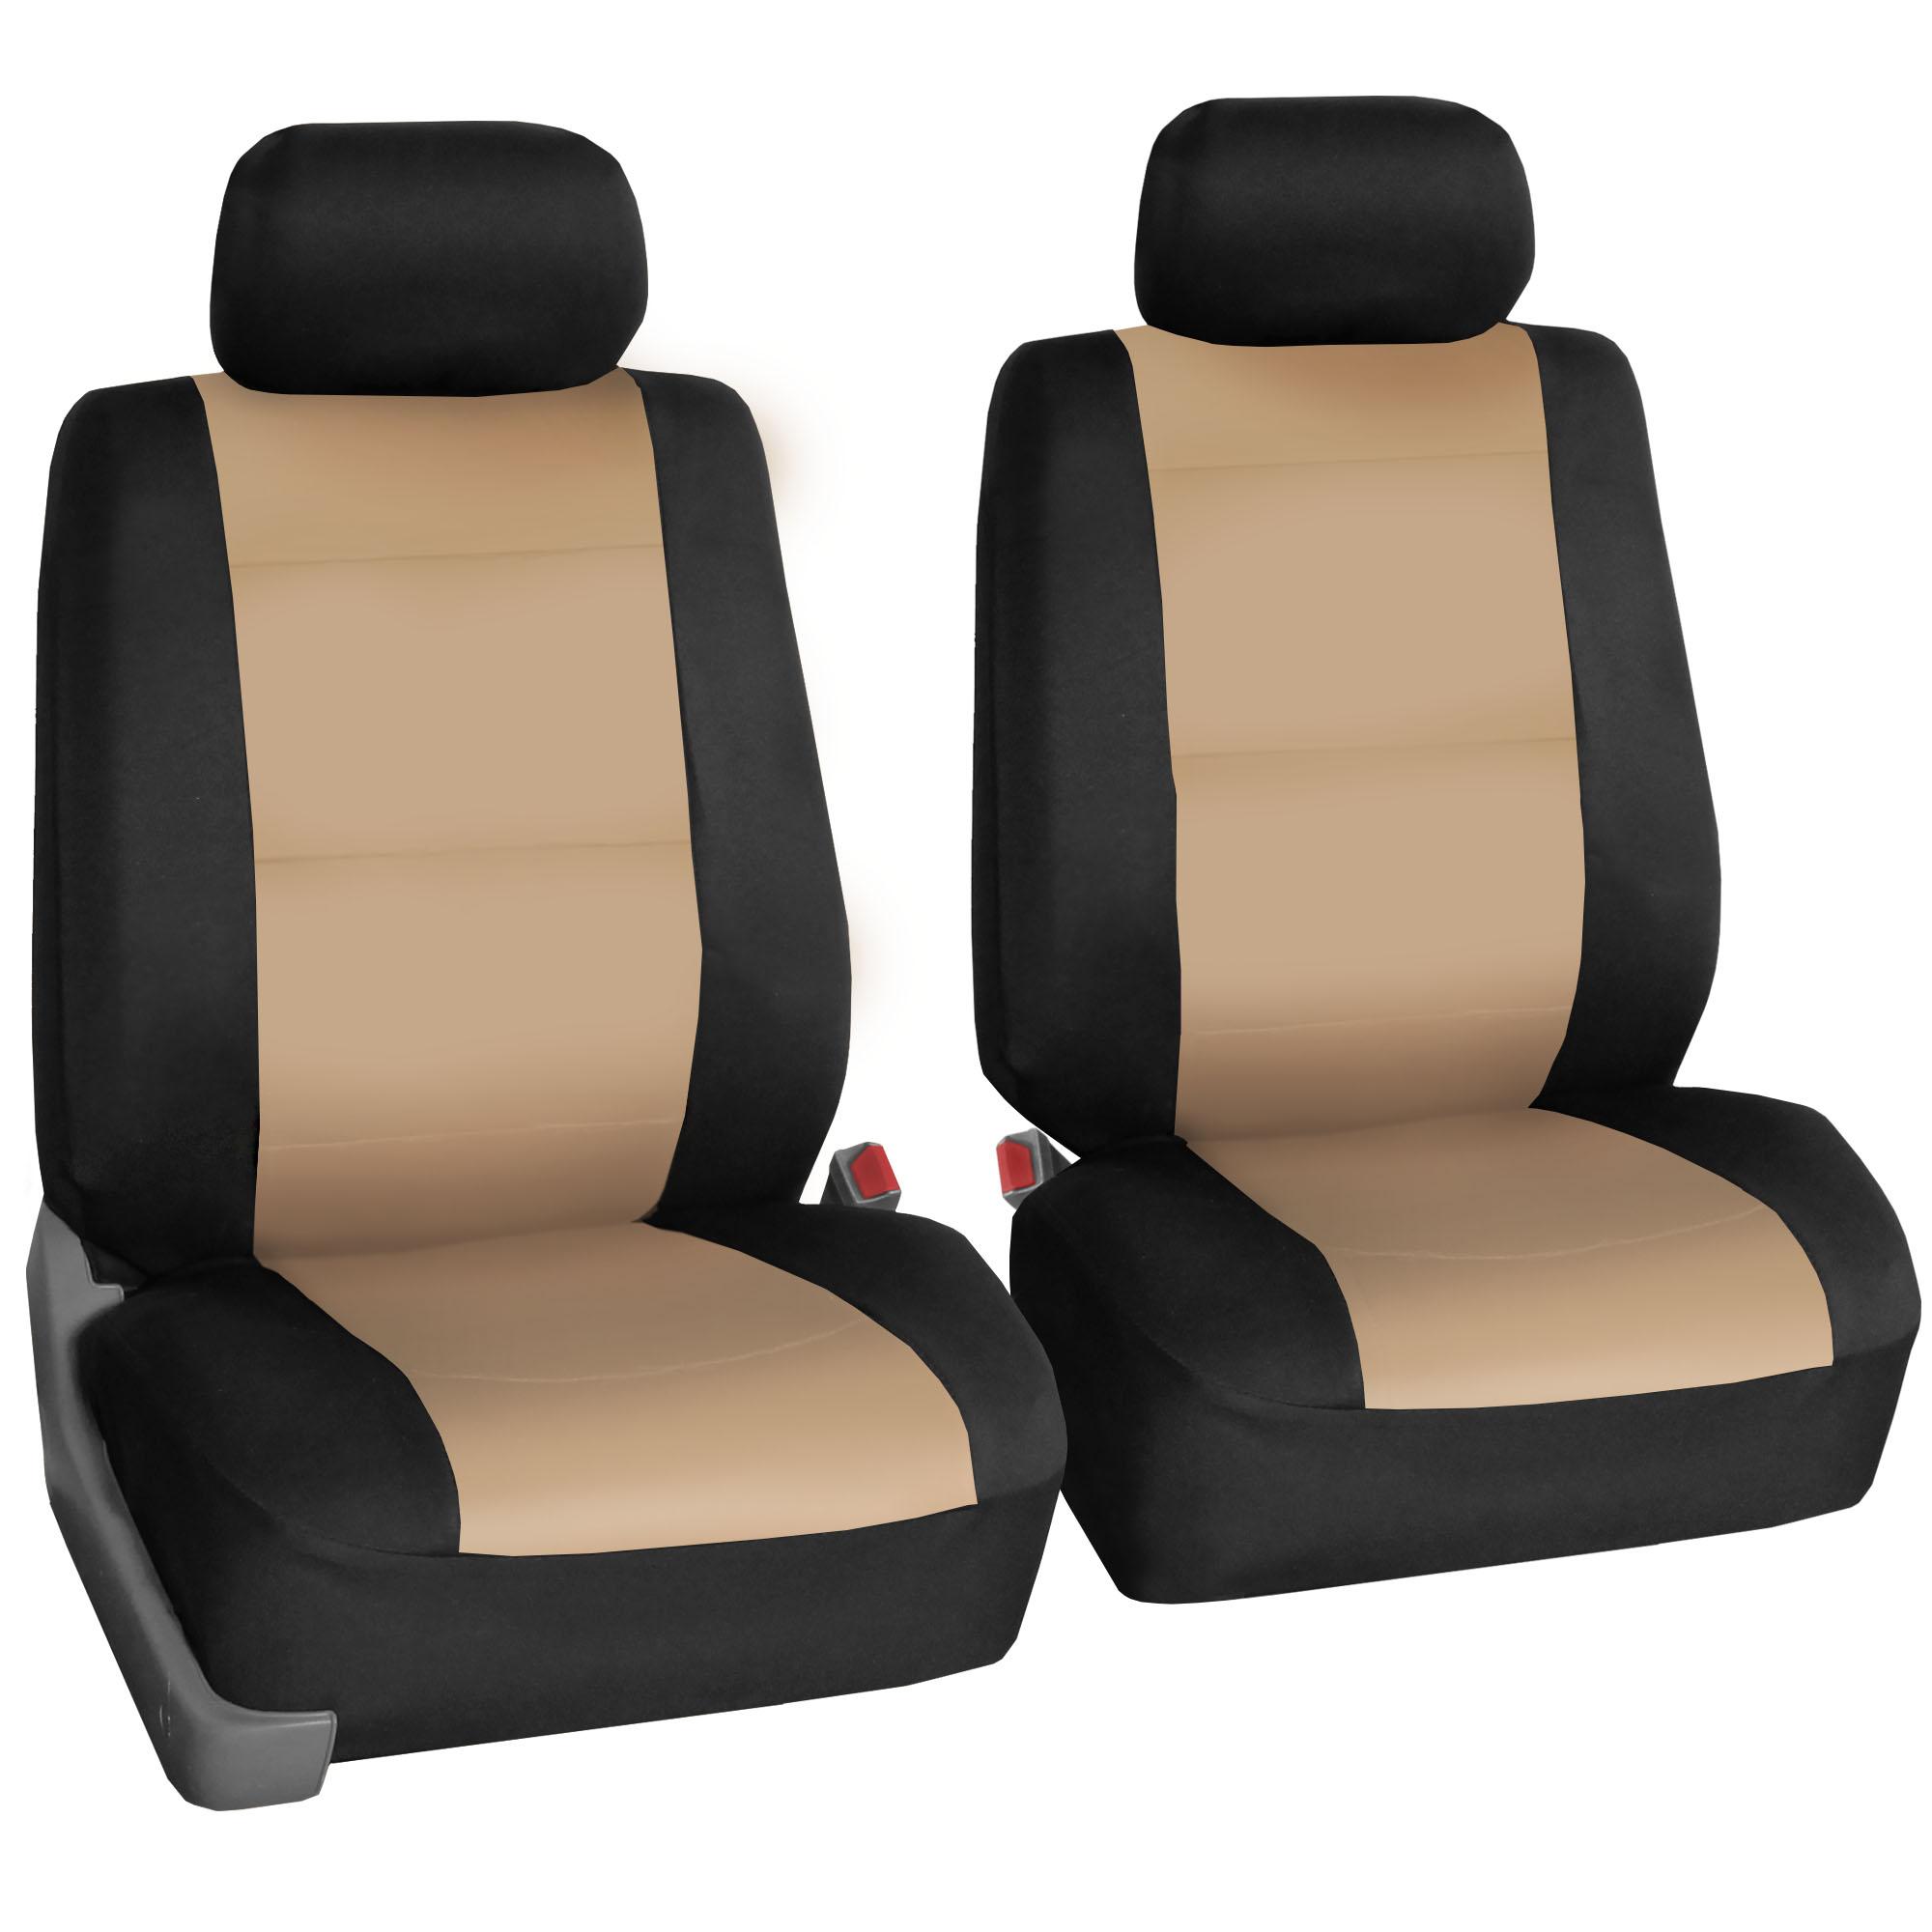 car seat cover neoprene waterproof pet proof full set 2 headrest cover beige ebay. Black Bedroom Furniture Sets. Home Design Ideas